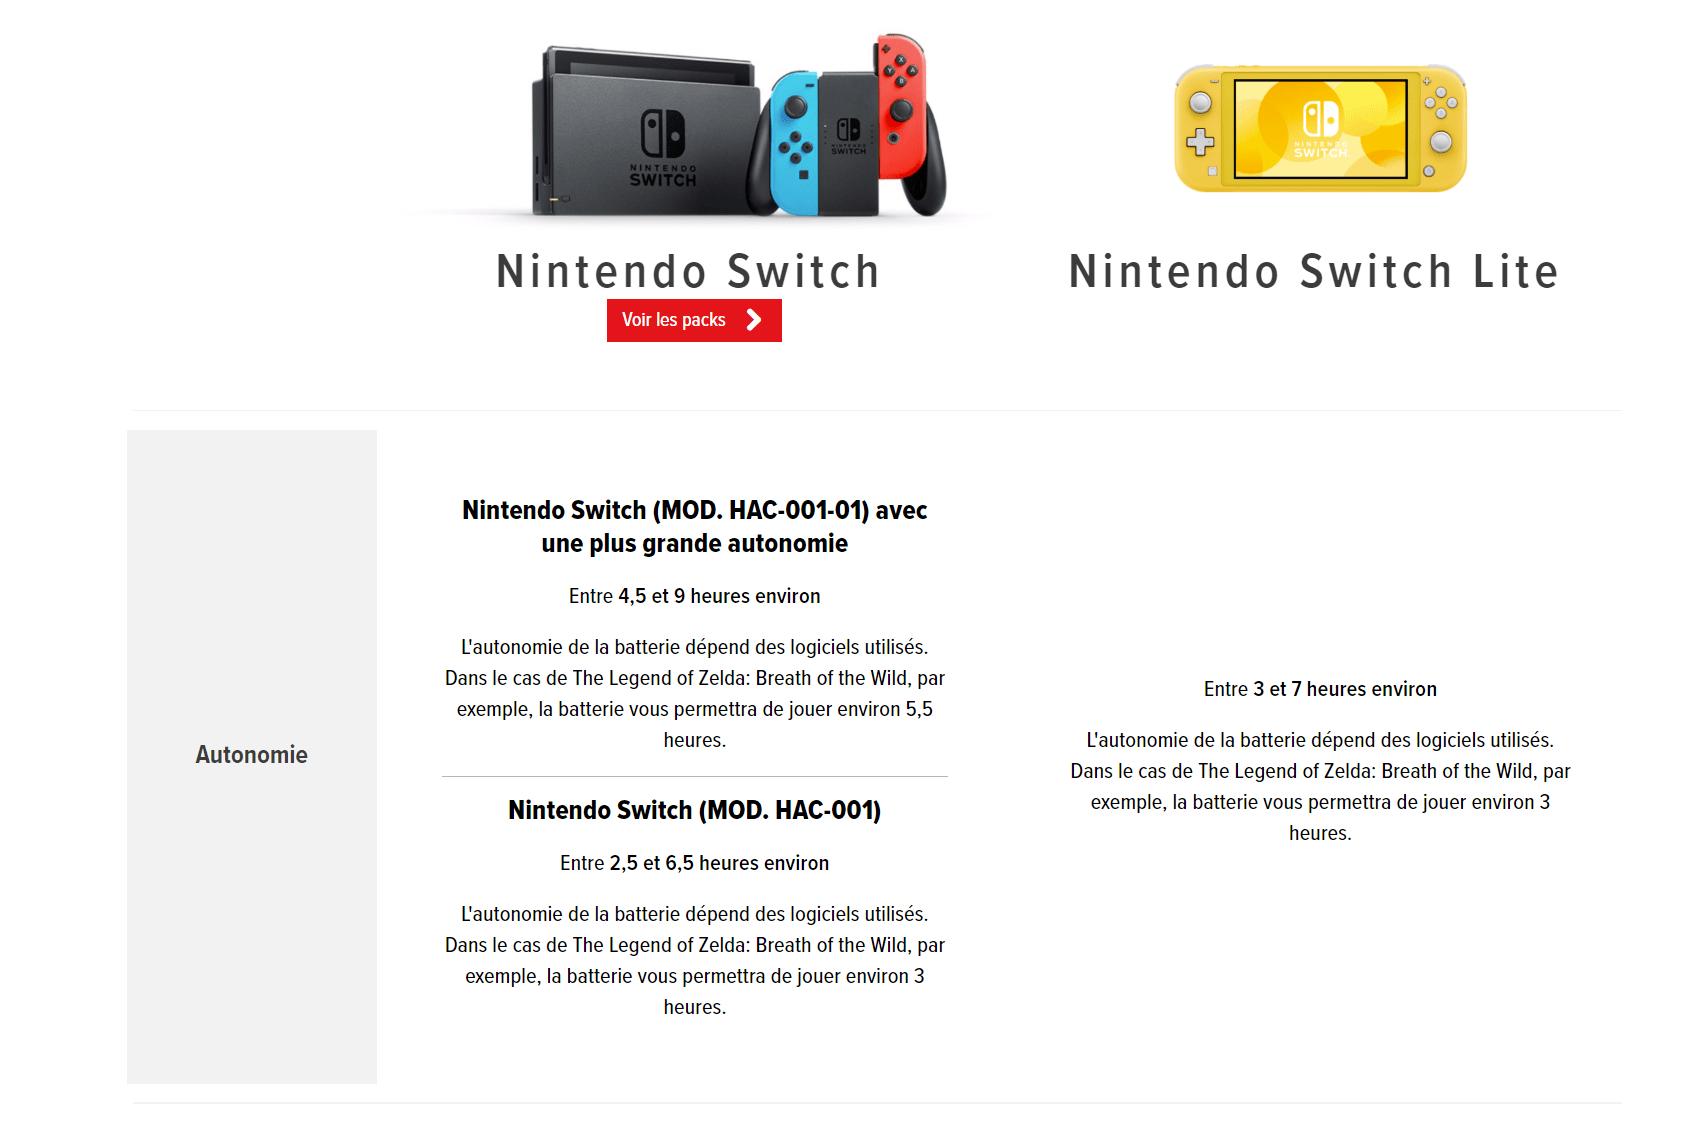 https://images.frandroid.com/wp-content/uploads/2019/07/nintendo-switch-comparatif-jpg.png